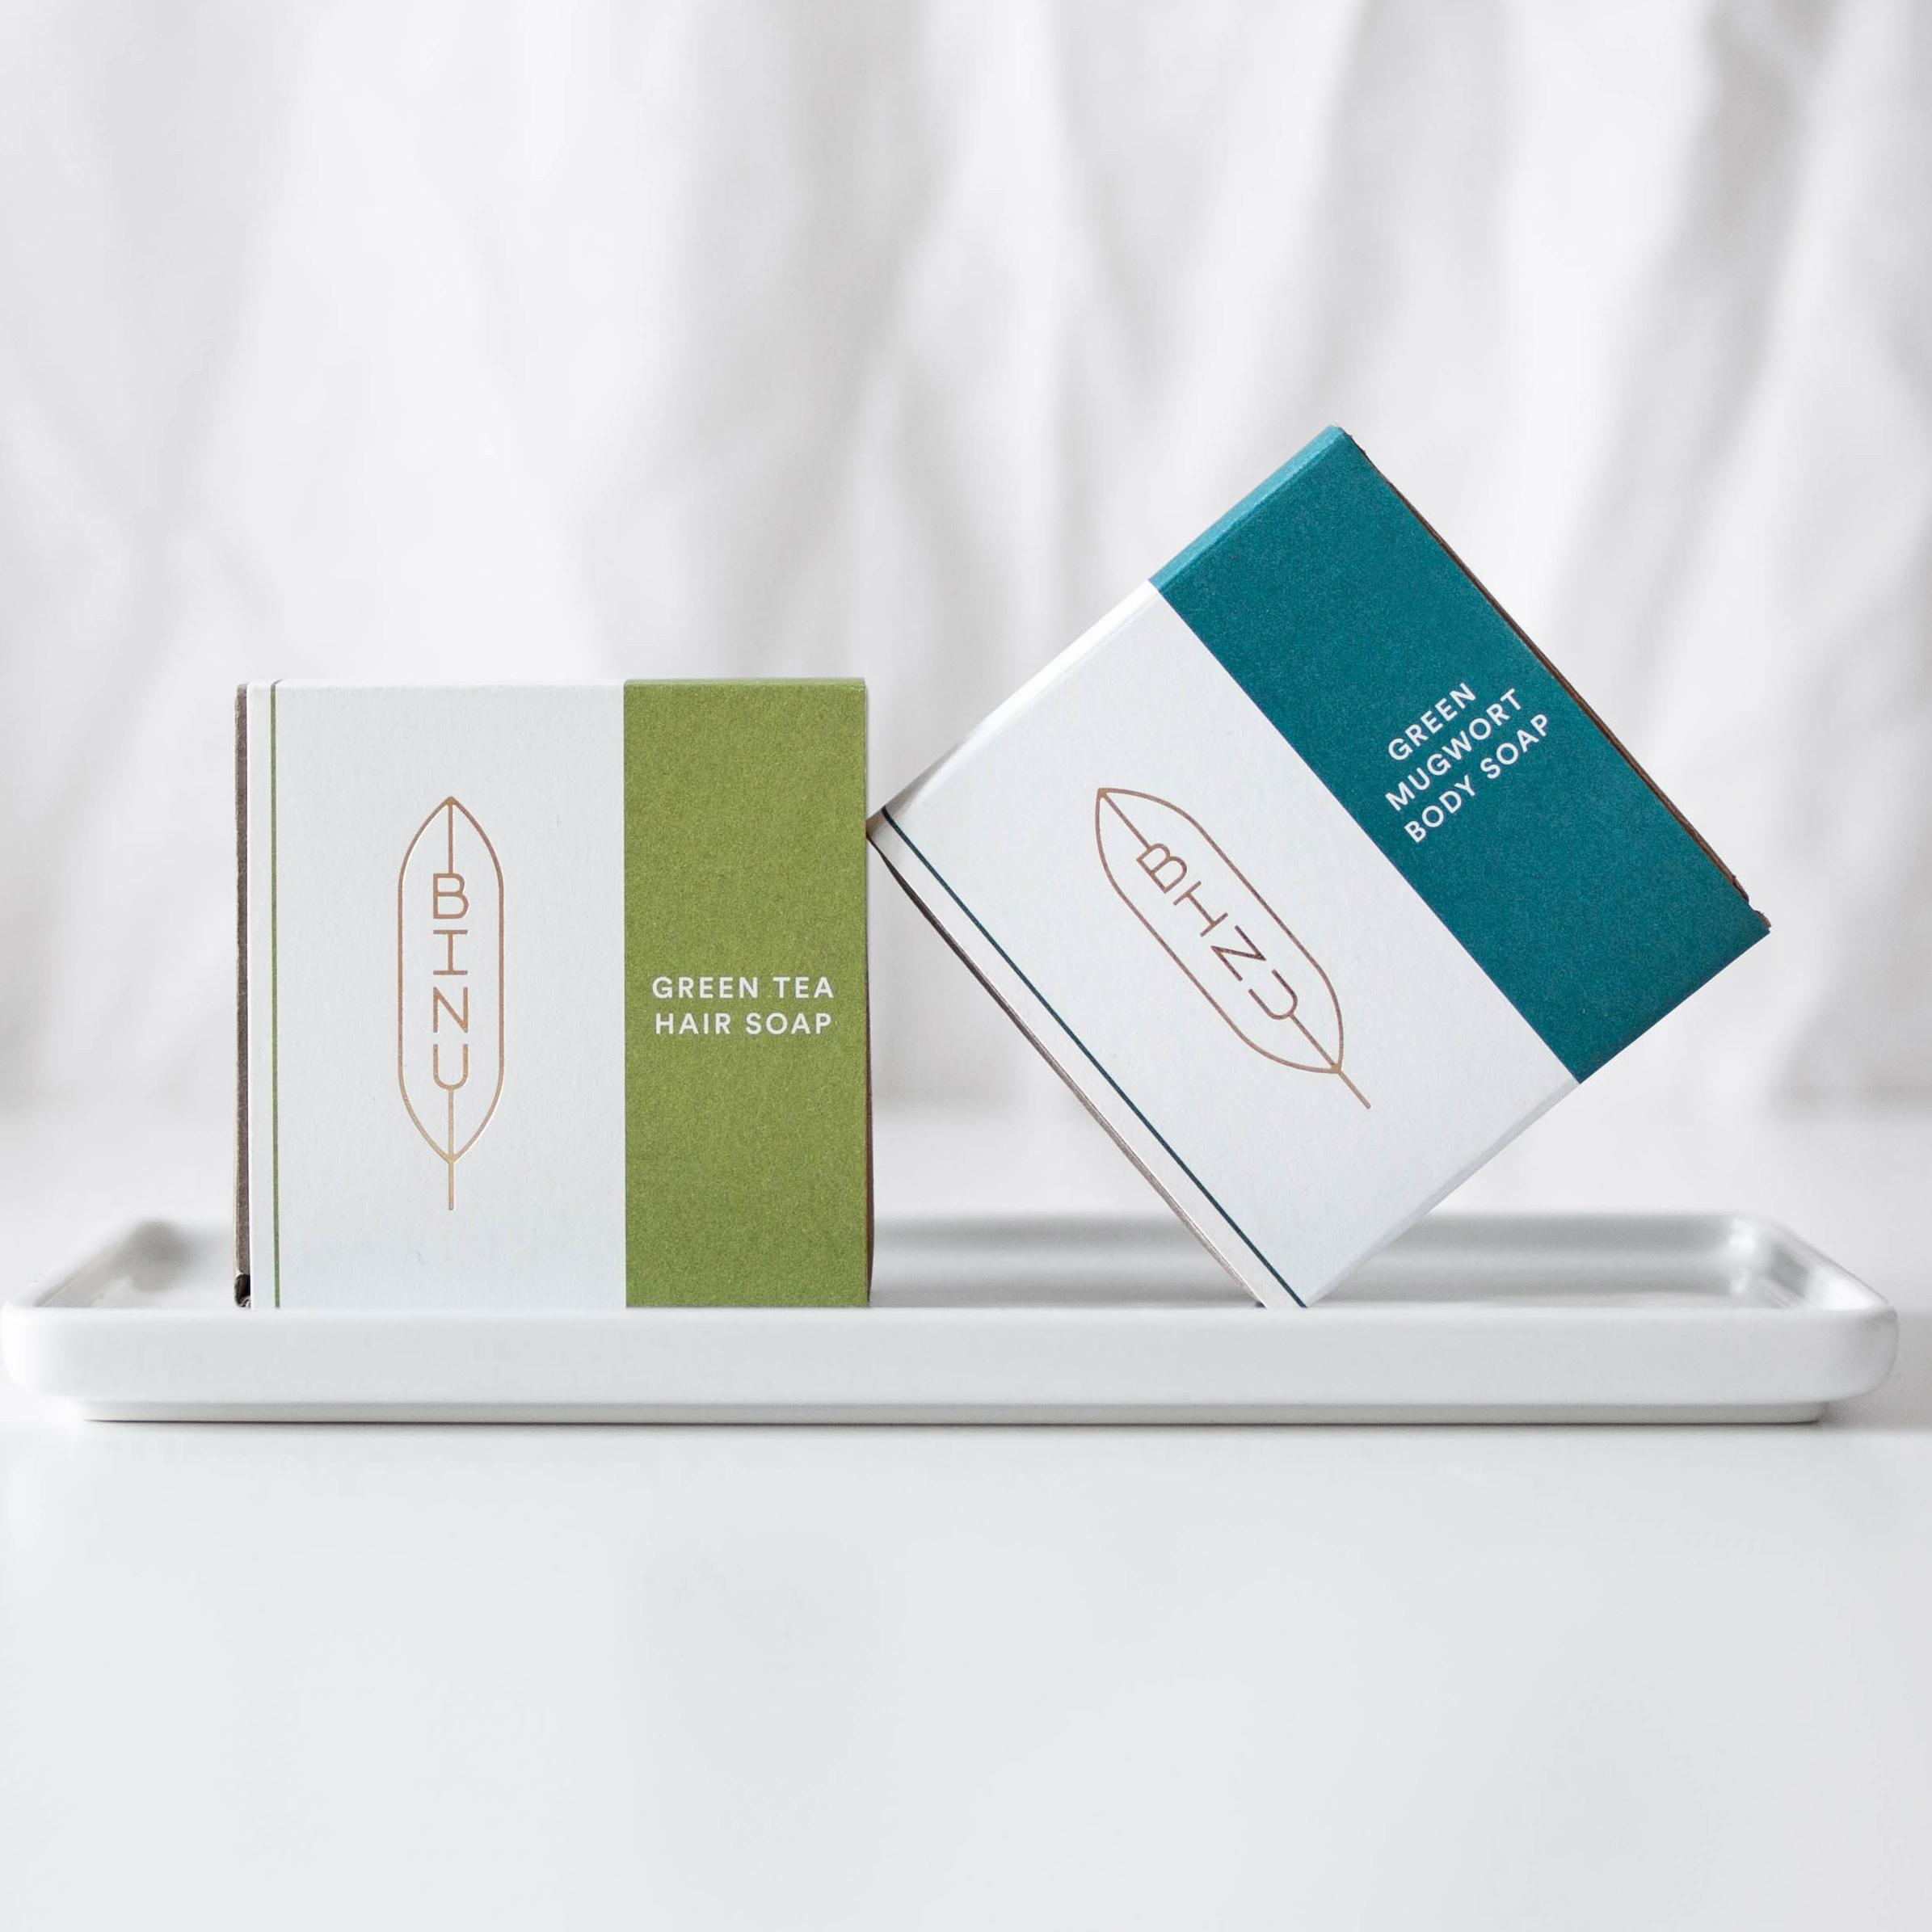 BINU-Bundle für Creme Guides